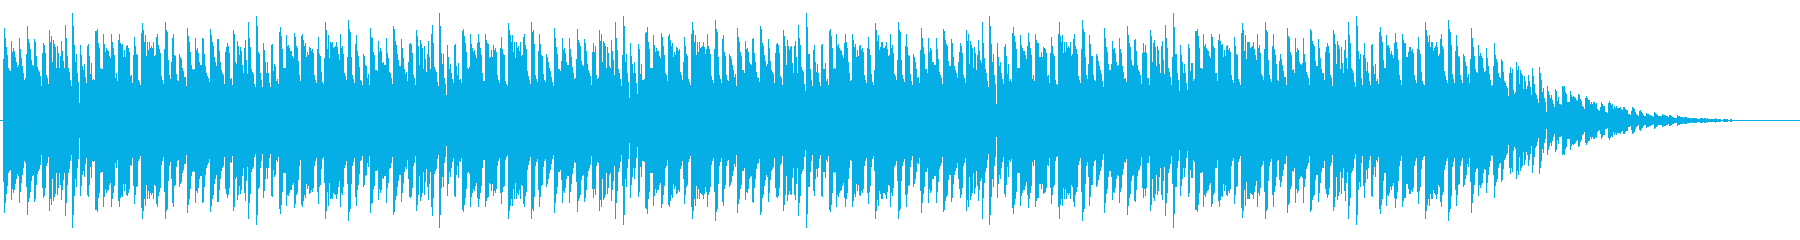 NES アクションD09-5(パワーアッの再生済みの波形